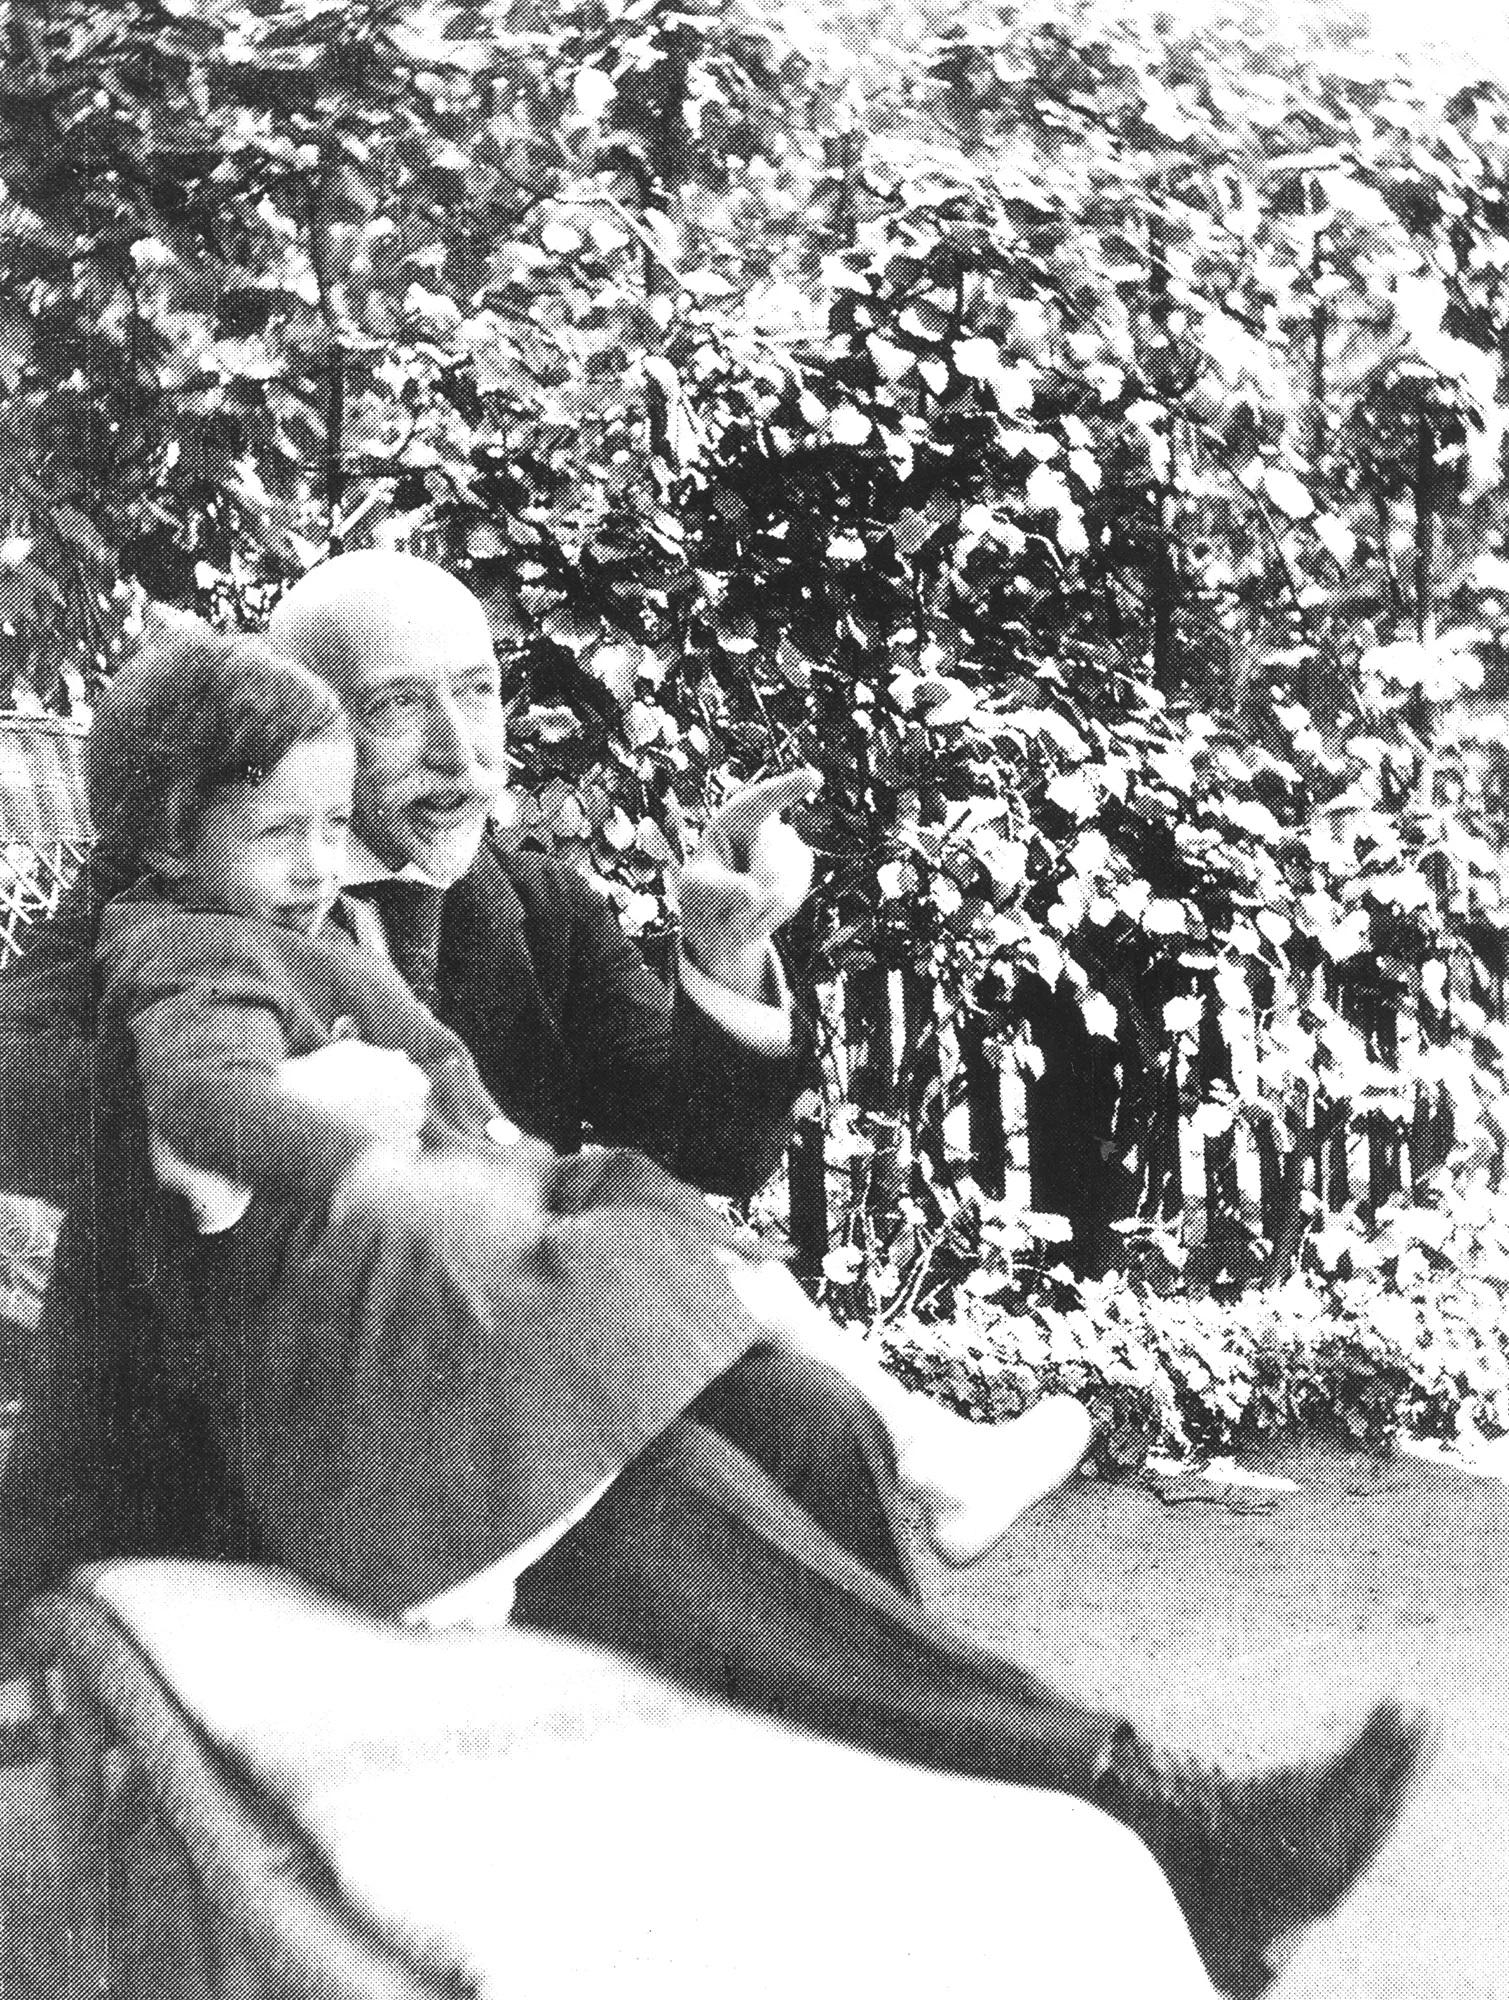 Gego con su tío Adolph Goldschmidt, Hamburgo 1917.